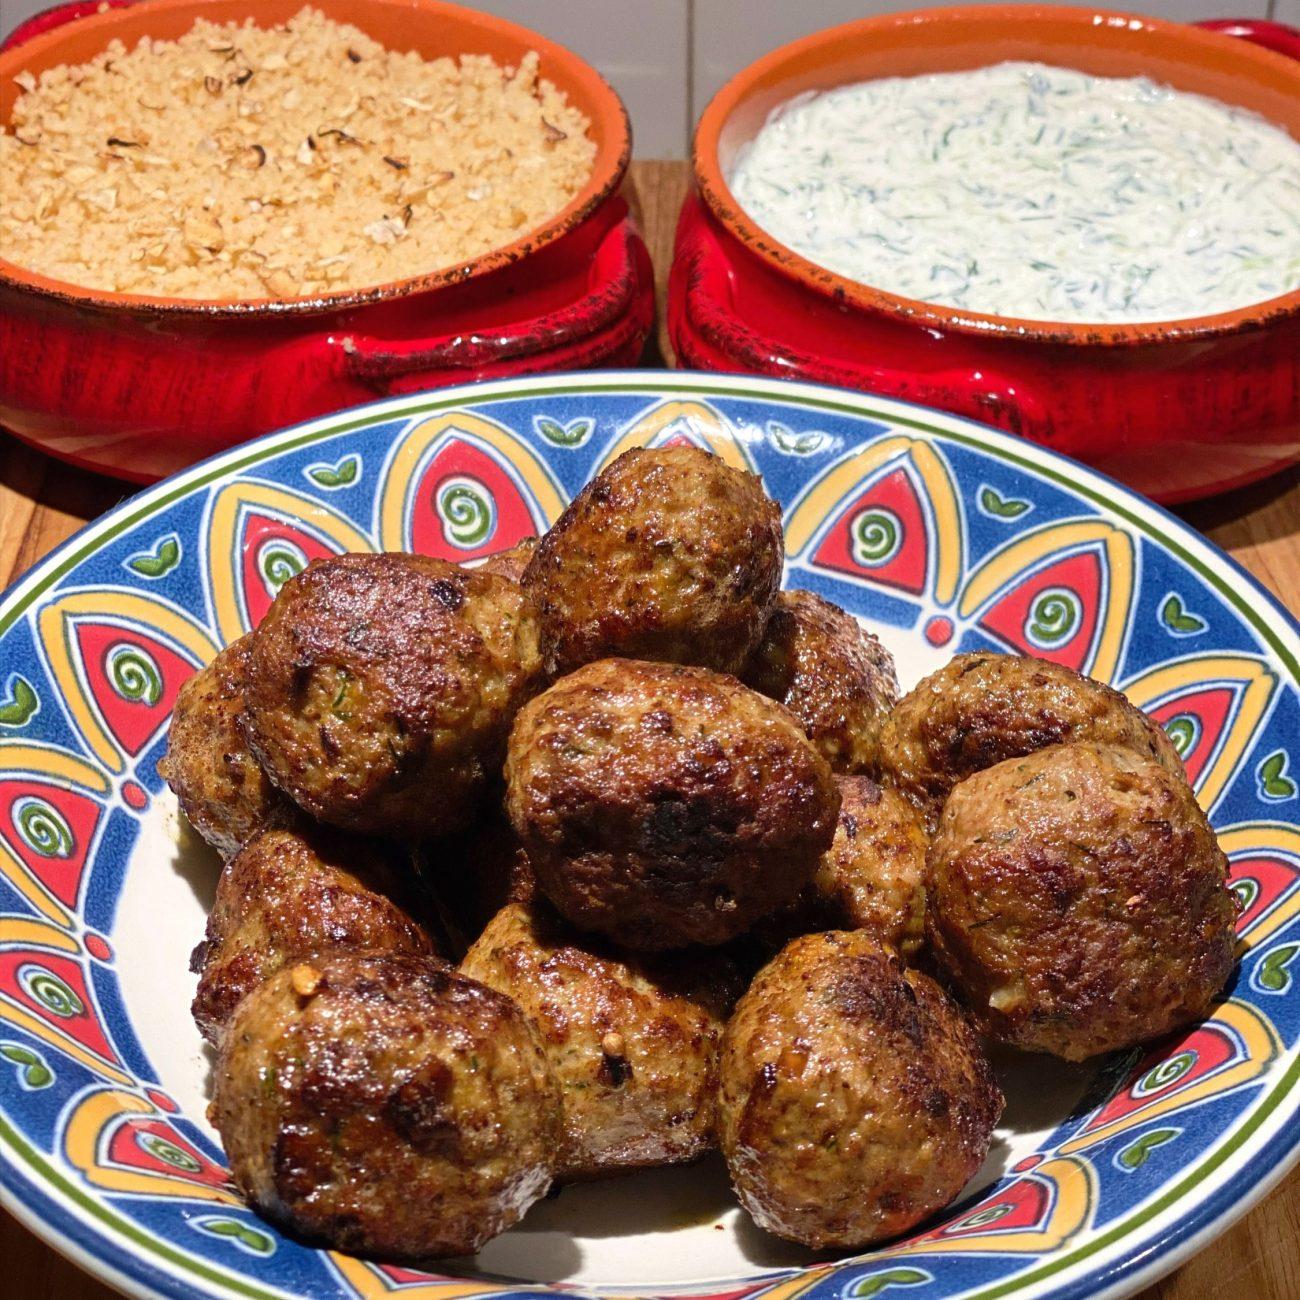 Moroccan style Lamb Meatballs